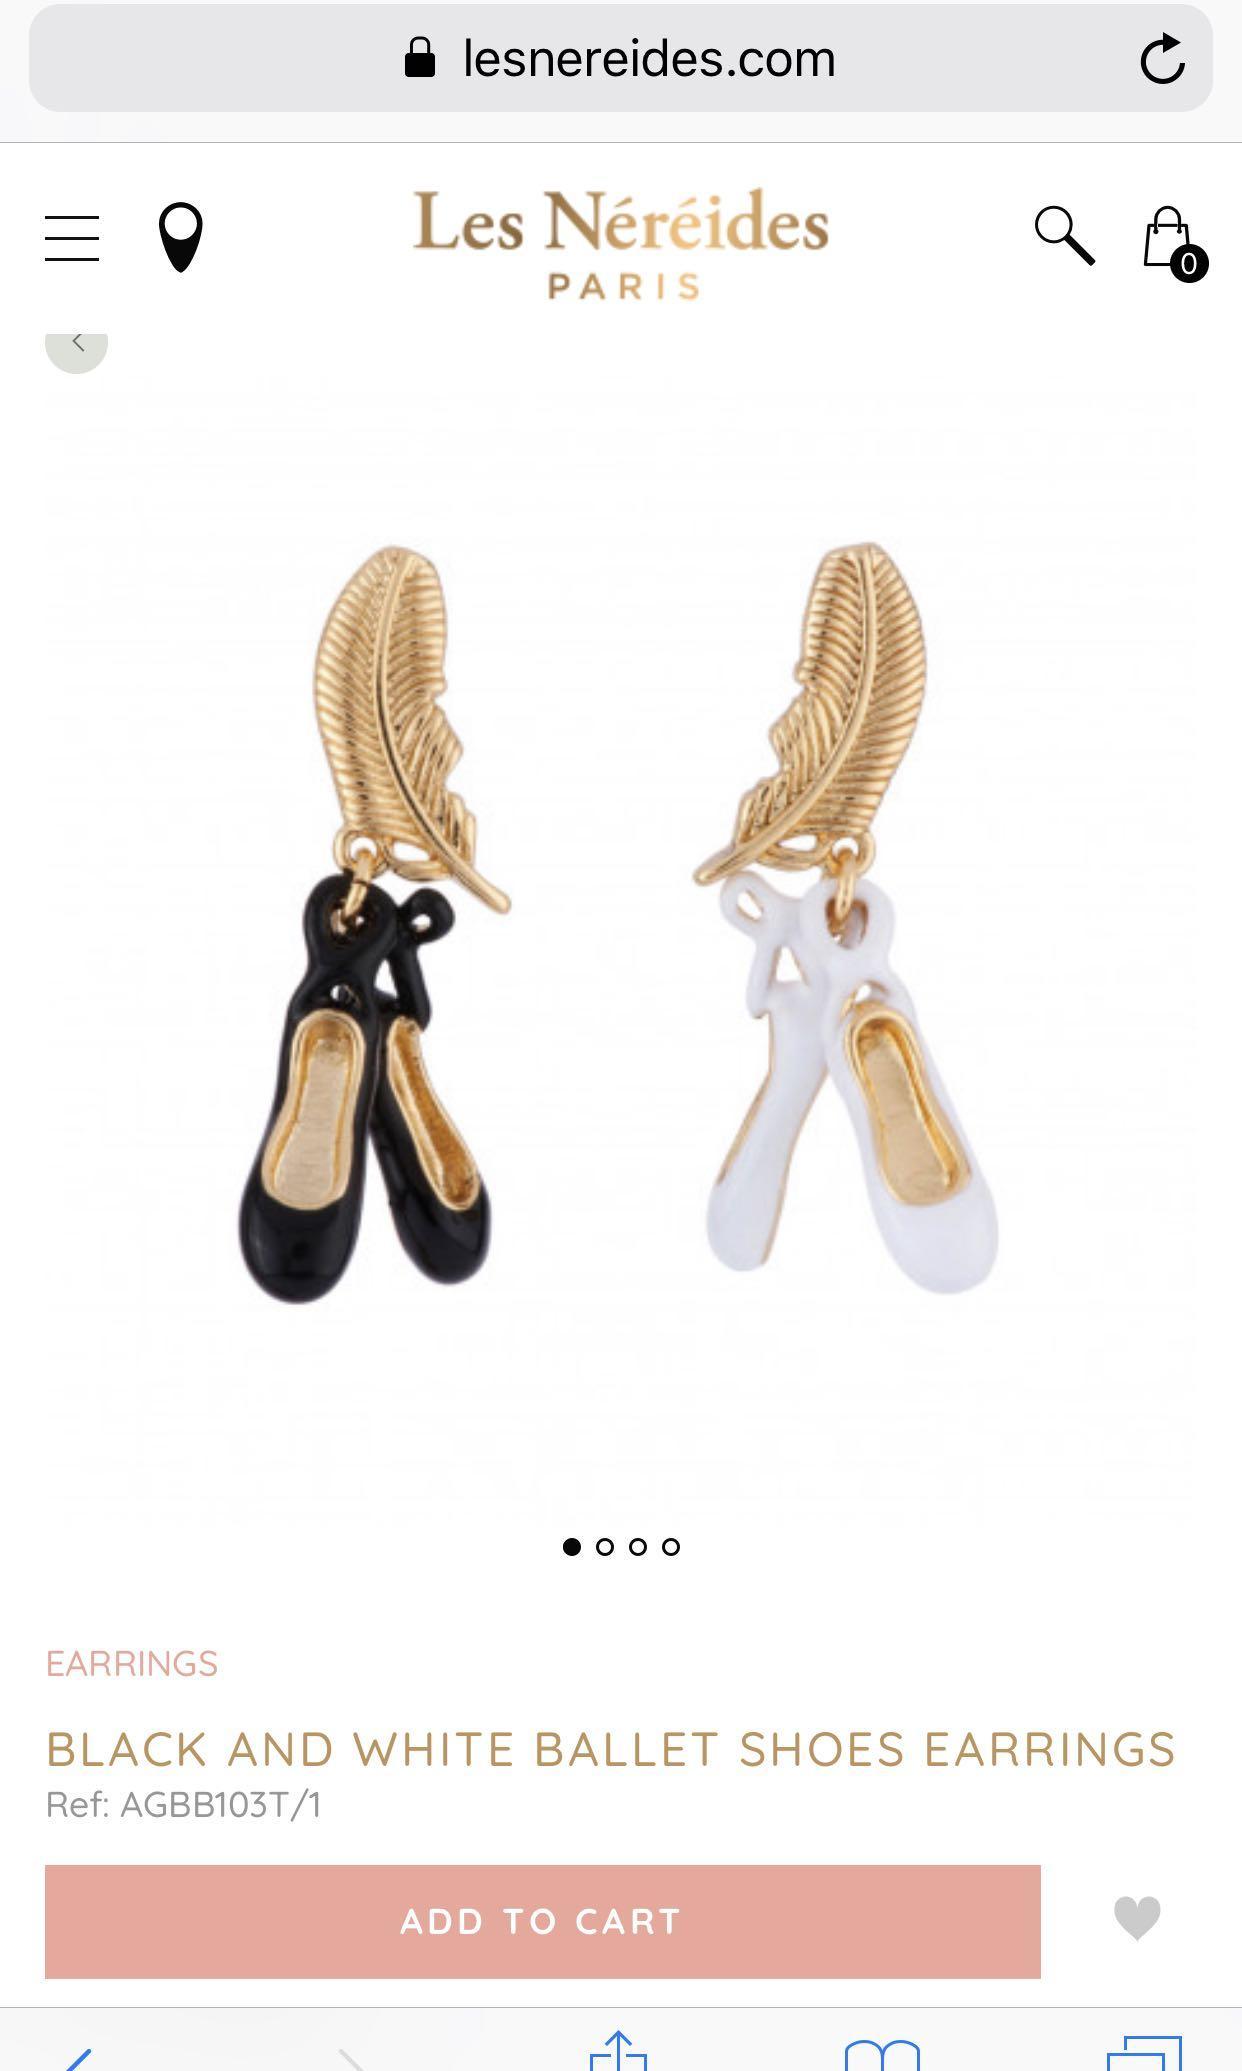 Les Nereides🥿🥿ballet shoes earrings🇫🇷